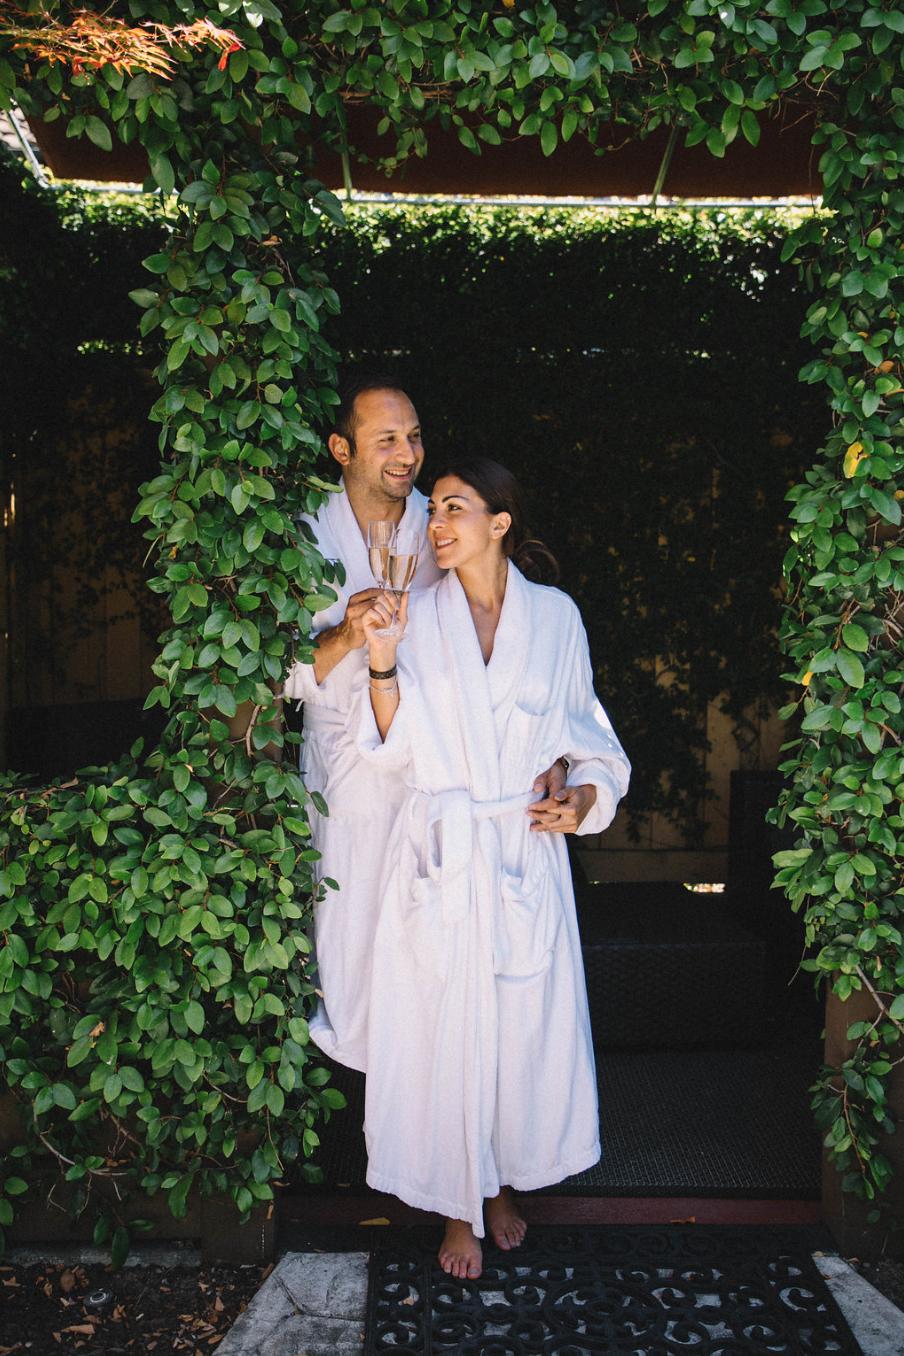 Julia O Test Creative - san francisco food hotel bar photography - the lodge at sonoma napa california - wine country